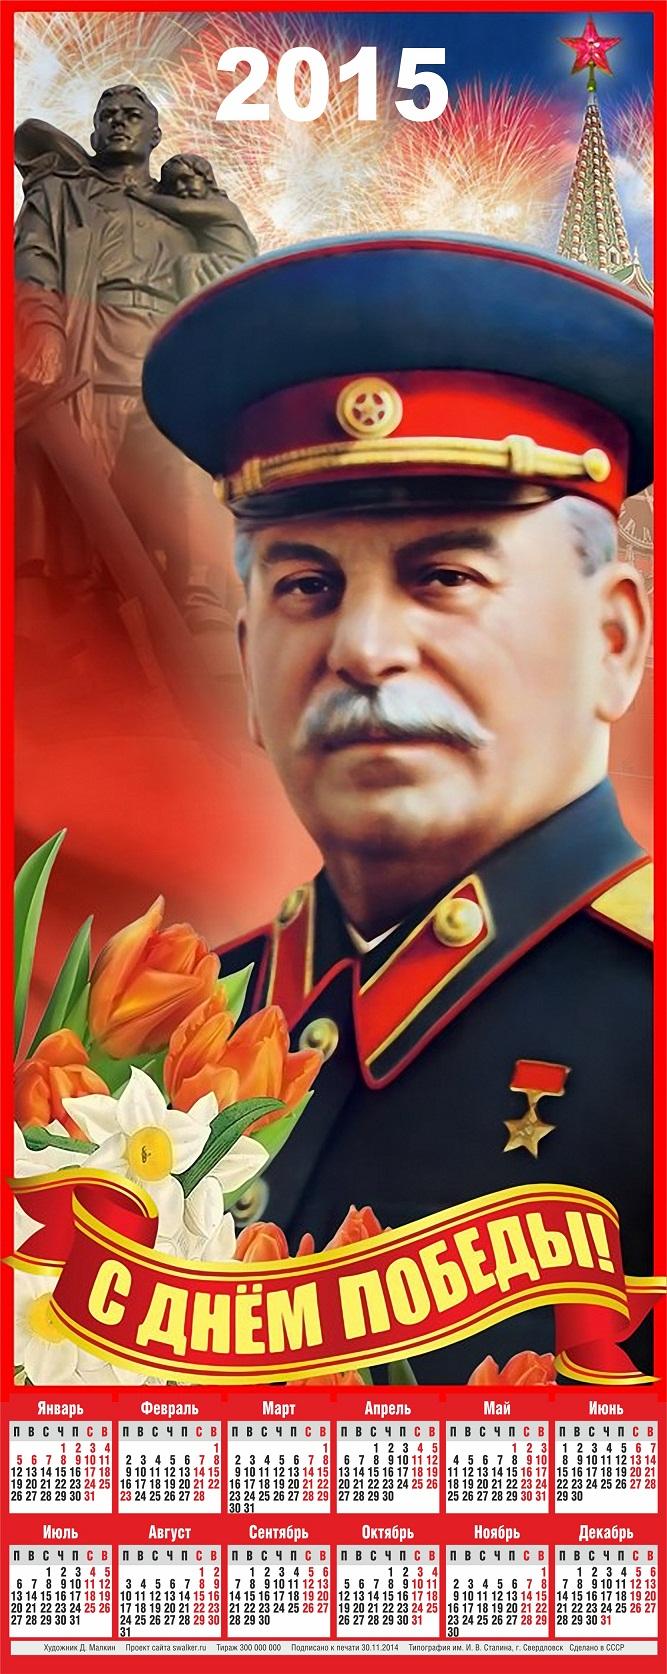 Malkin_Dmitri_calendar-2015_Stalin_7_S_Dnyom_Pobedy_swalker_org